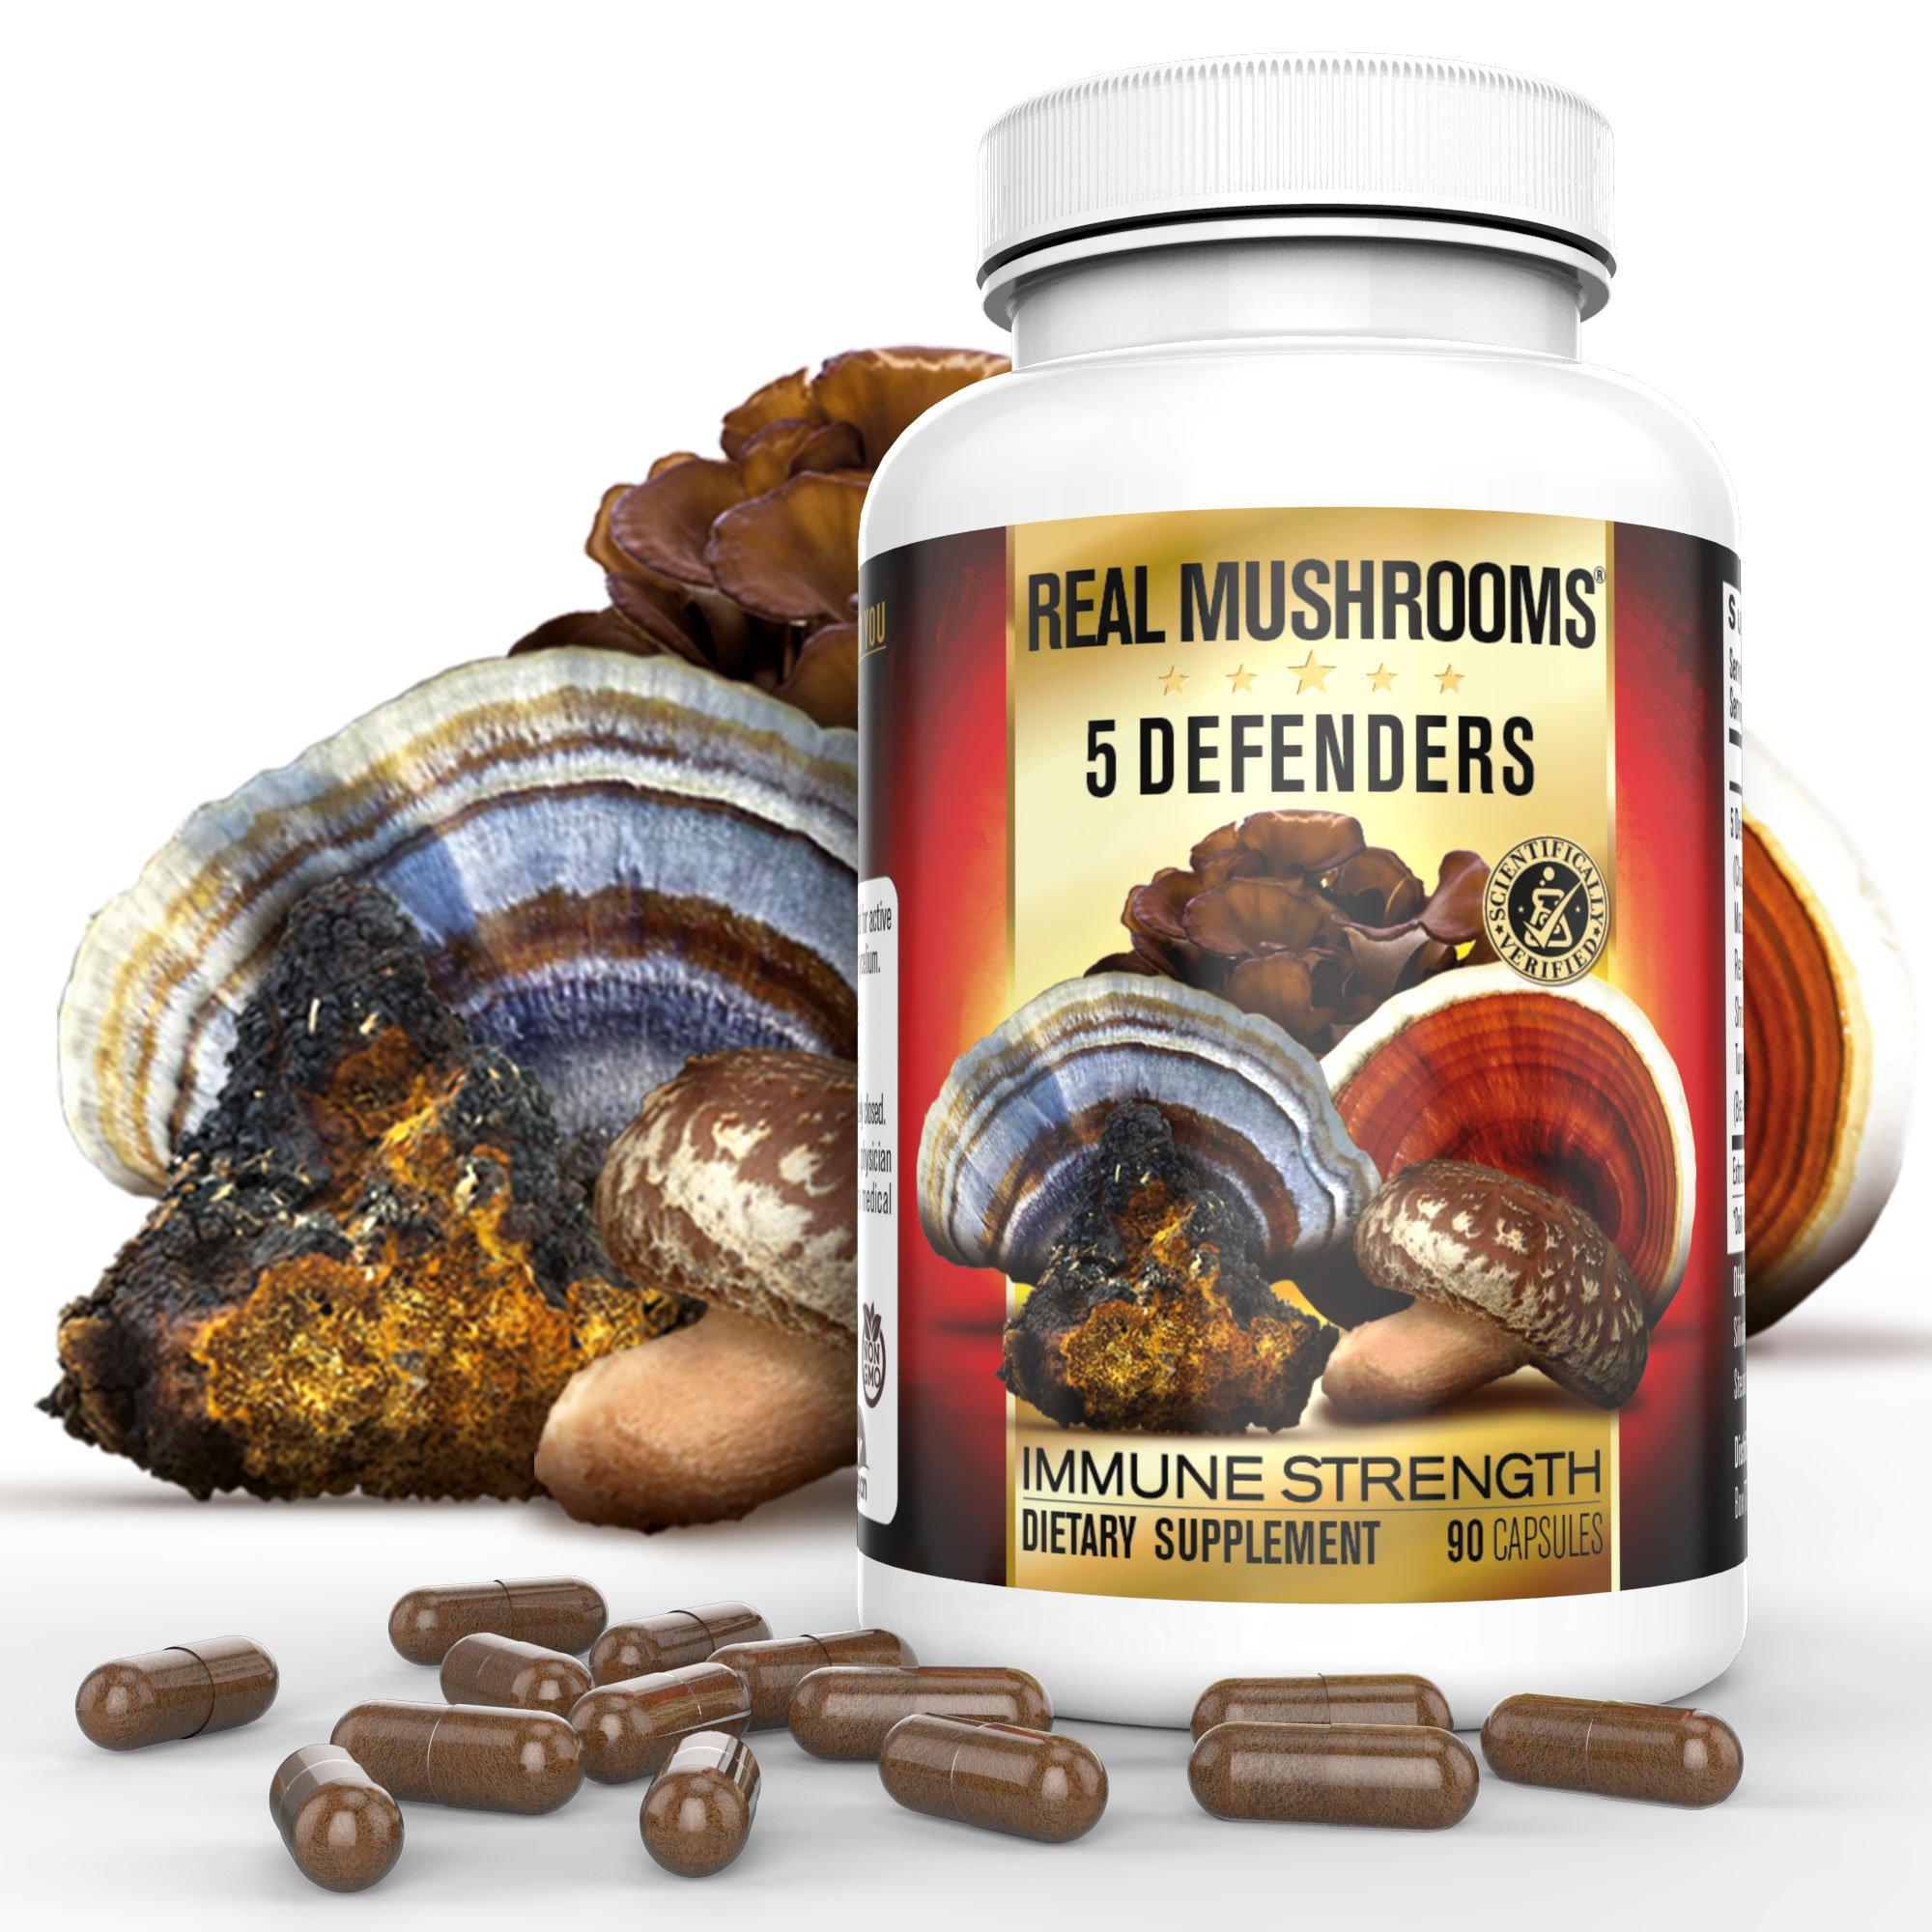 5 Defenders Organic Mushroom Extract Blend by Real Mushrooms - 90 Capsules - Chaga, Reishi, Shiitake, Maitake and Turkey Tail Mushroom Powder - Immune Defense